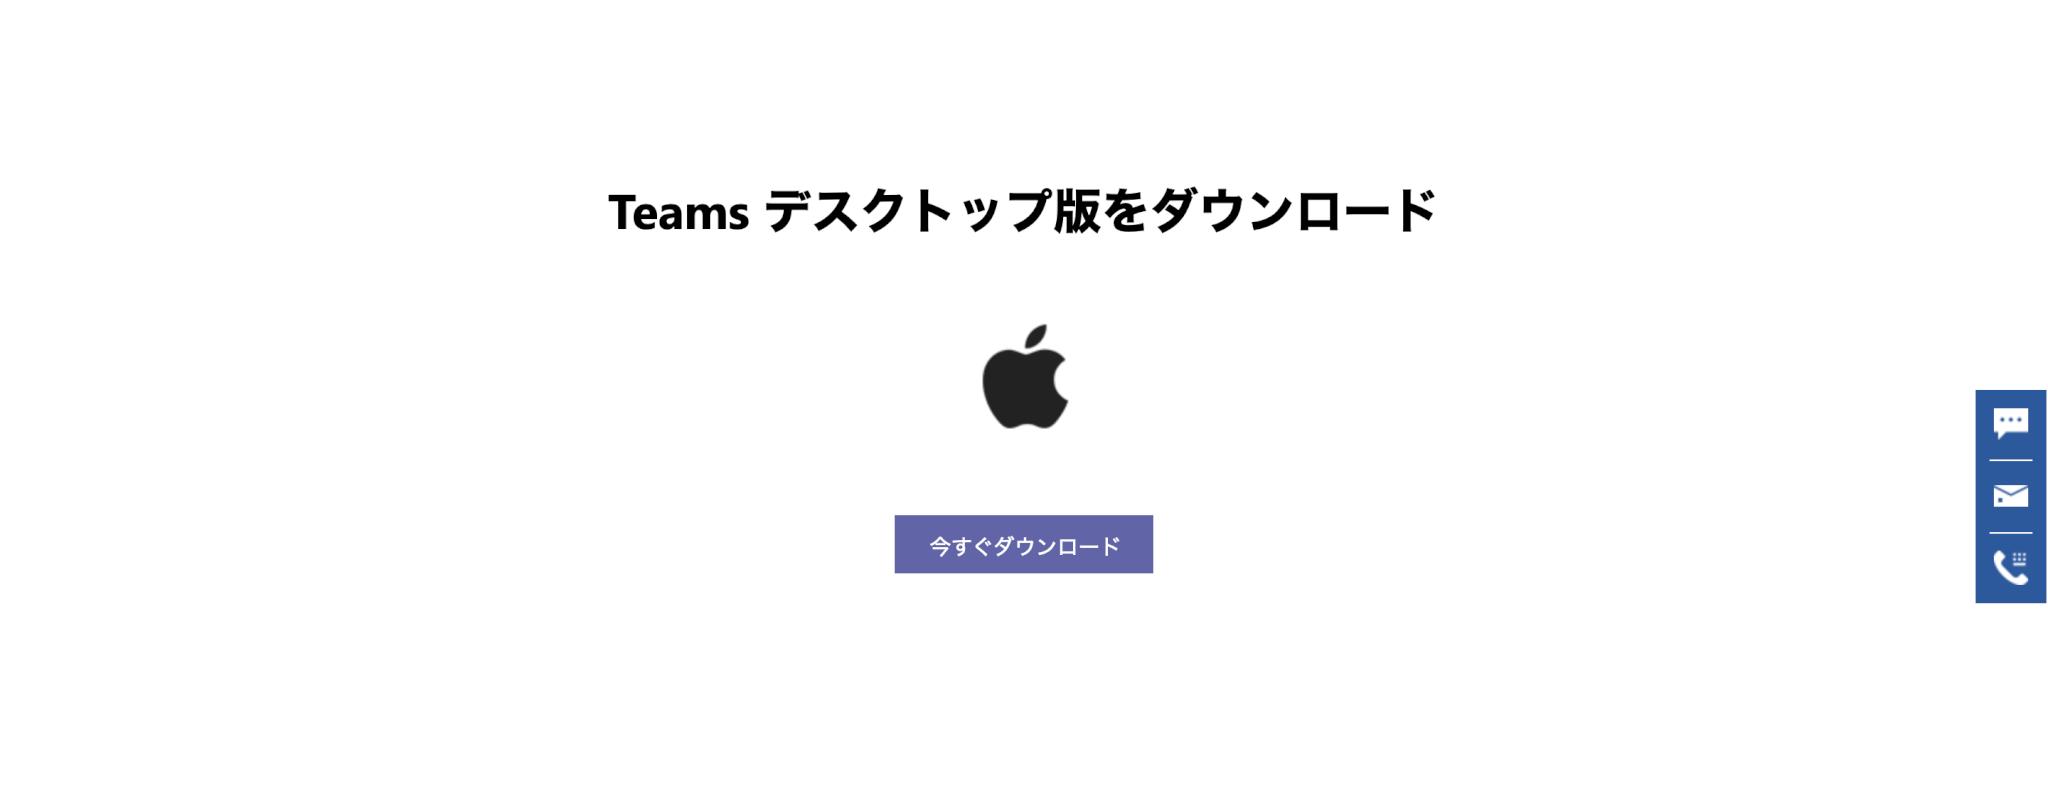 Teams 開か ない